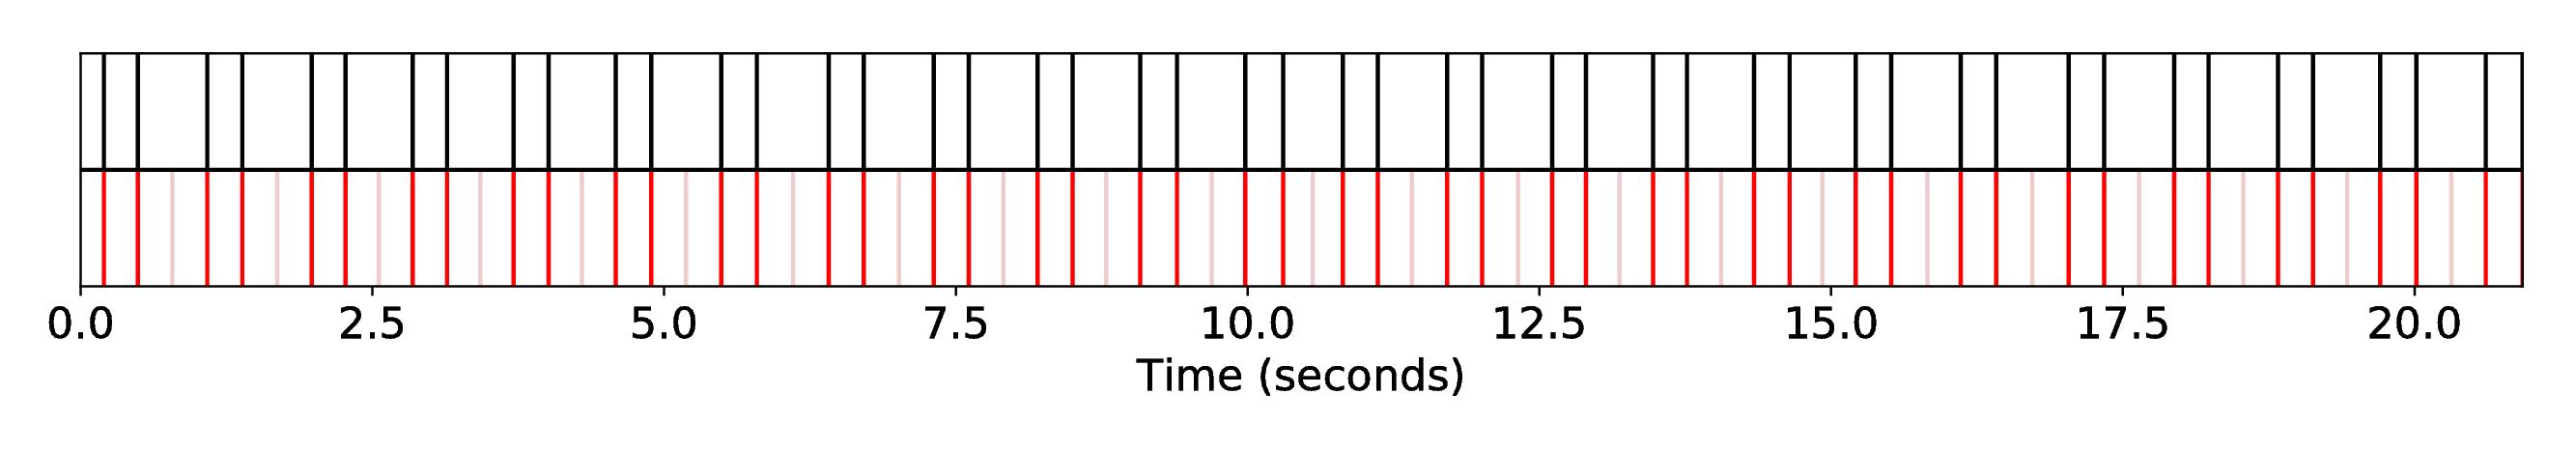 DP1_INT1_R-RW-Heart__S-Bach__SequenceAlignment